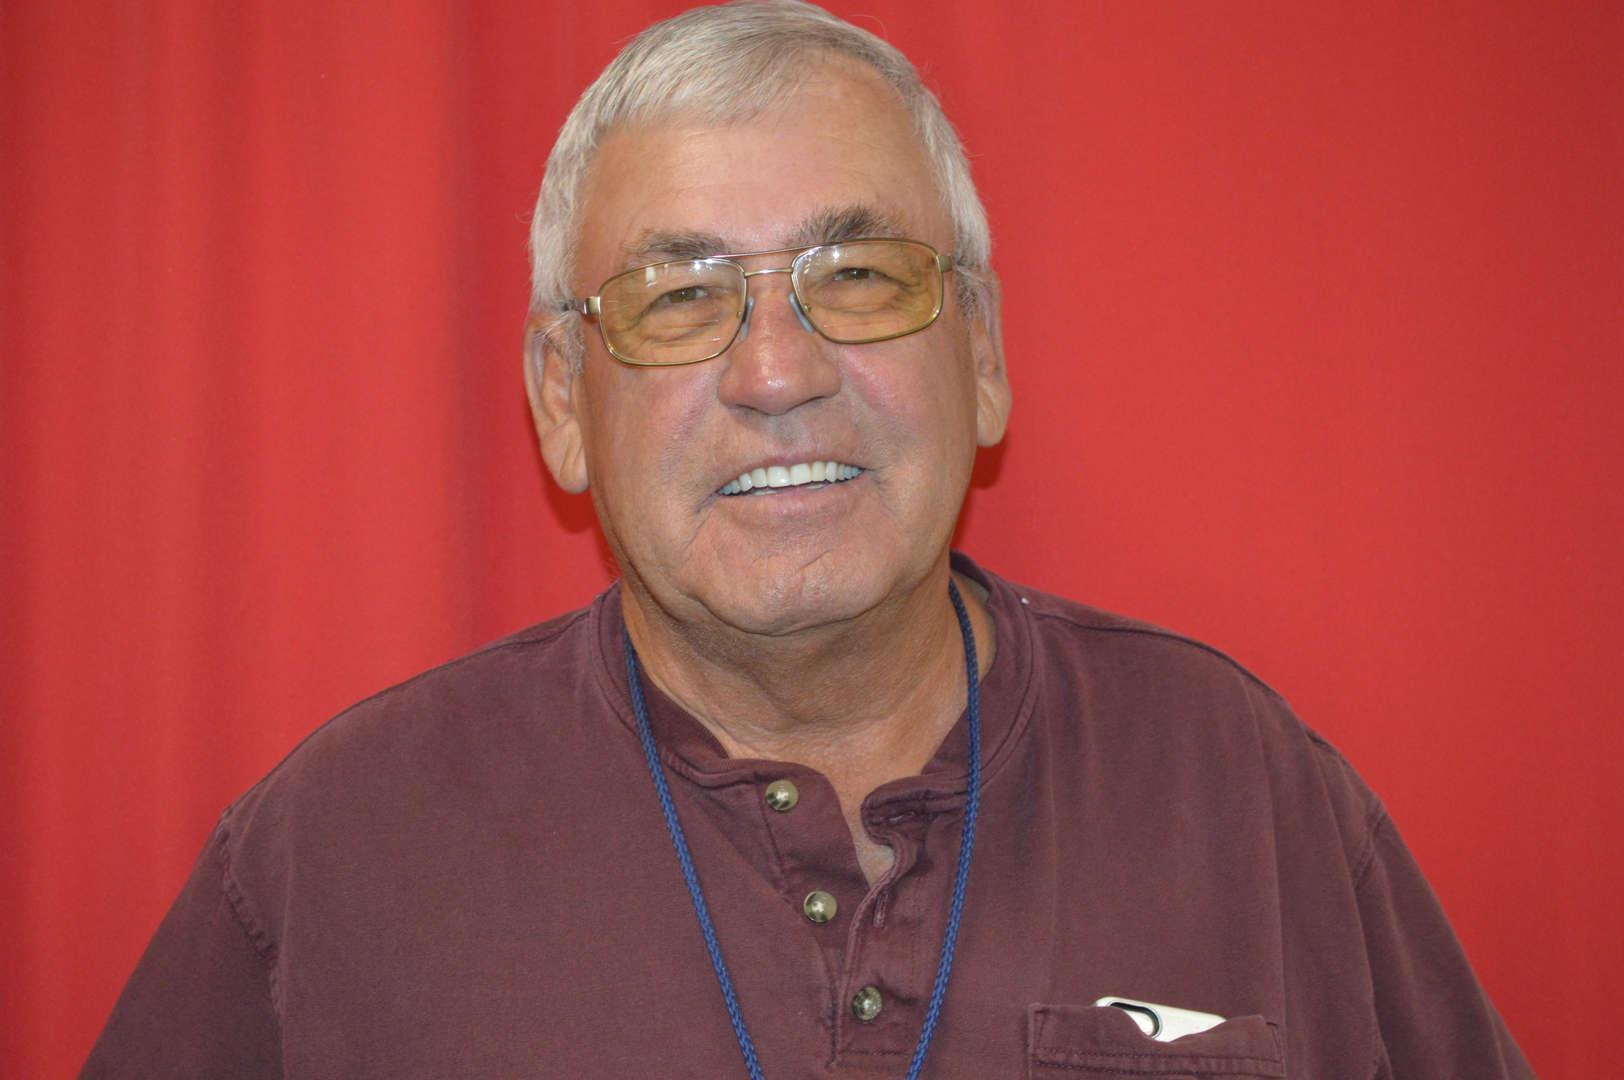 Melvin Mathis - Lead Custodian